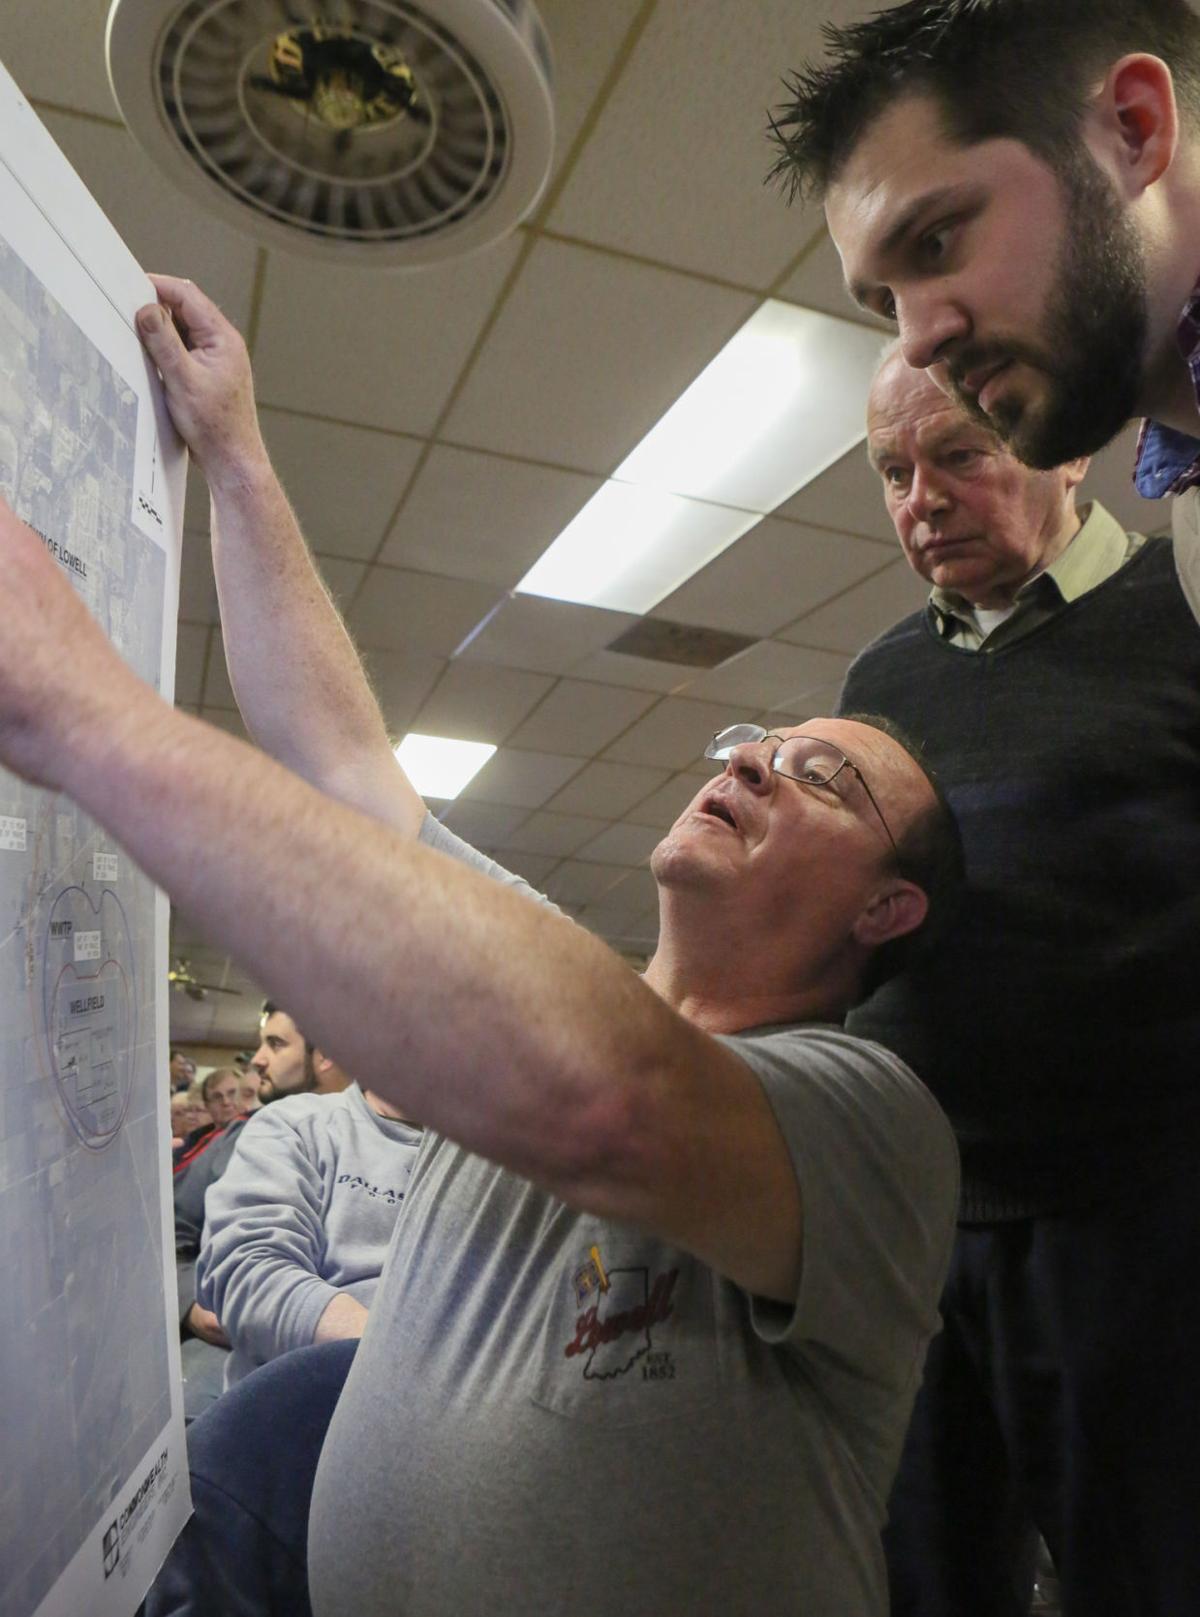 U.S. Surface Transportation Board holds a public hearing